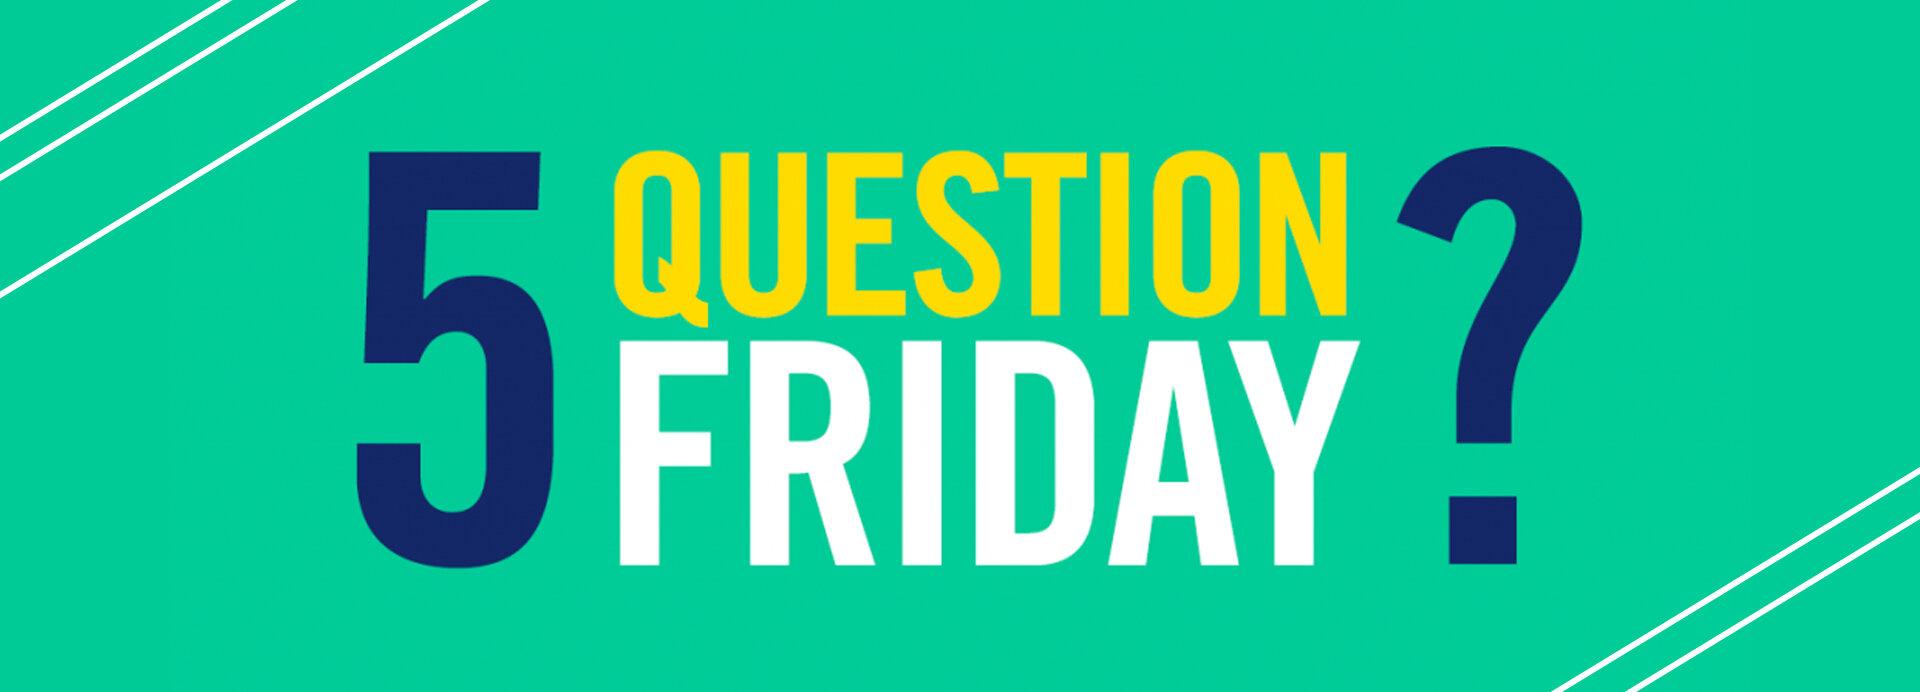 5 Question Friday.jpg